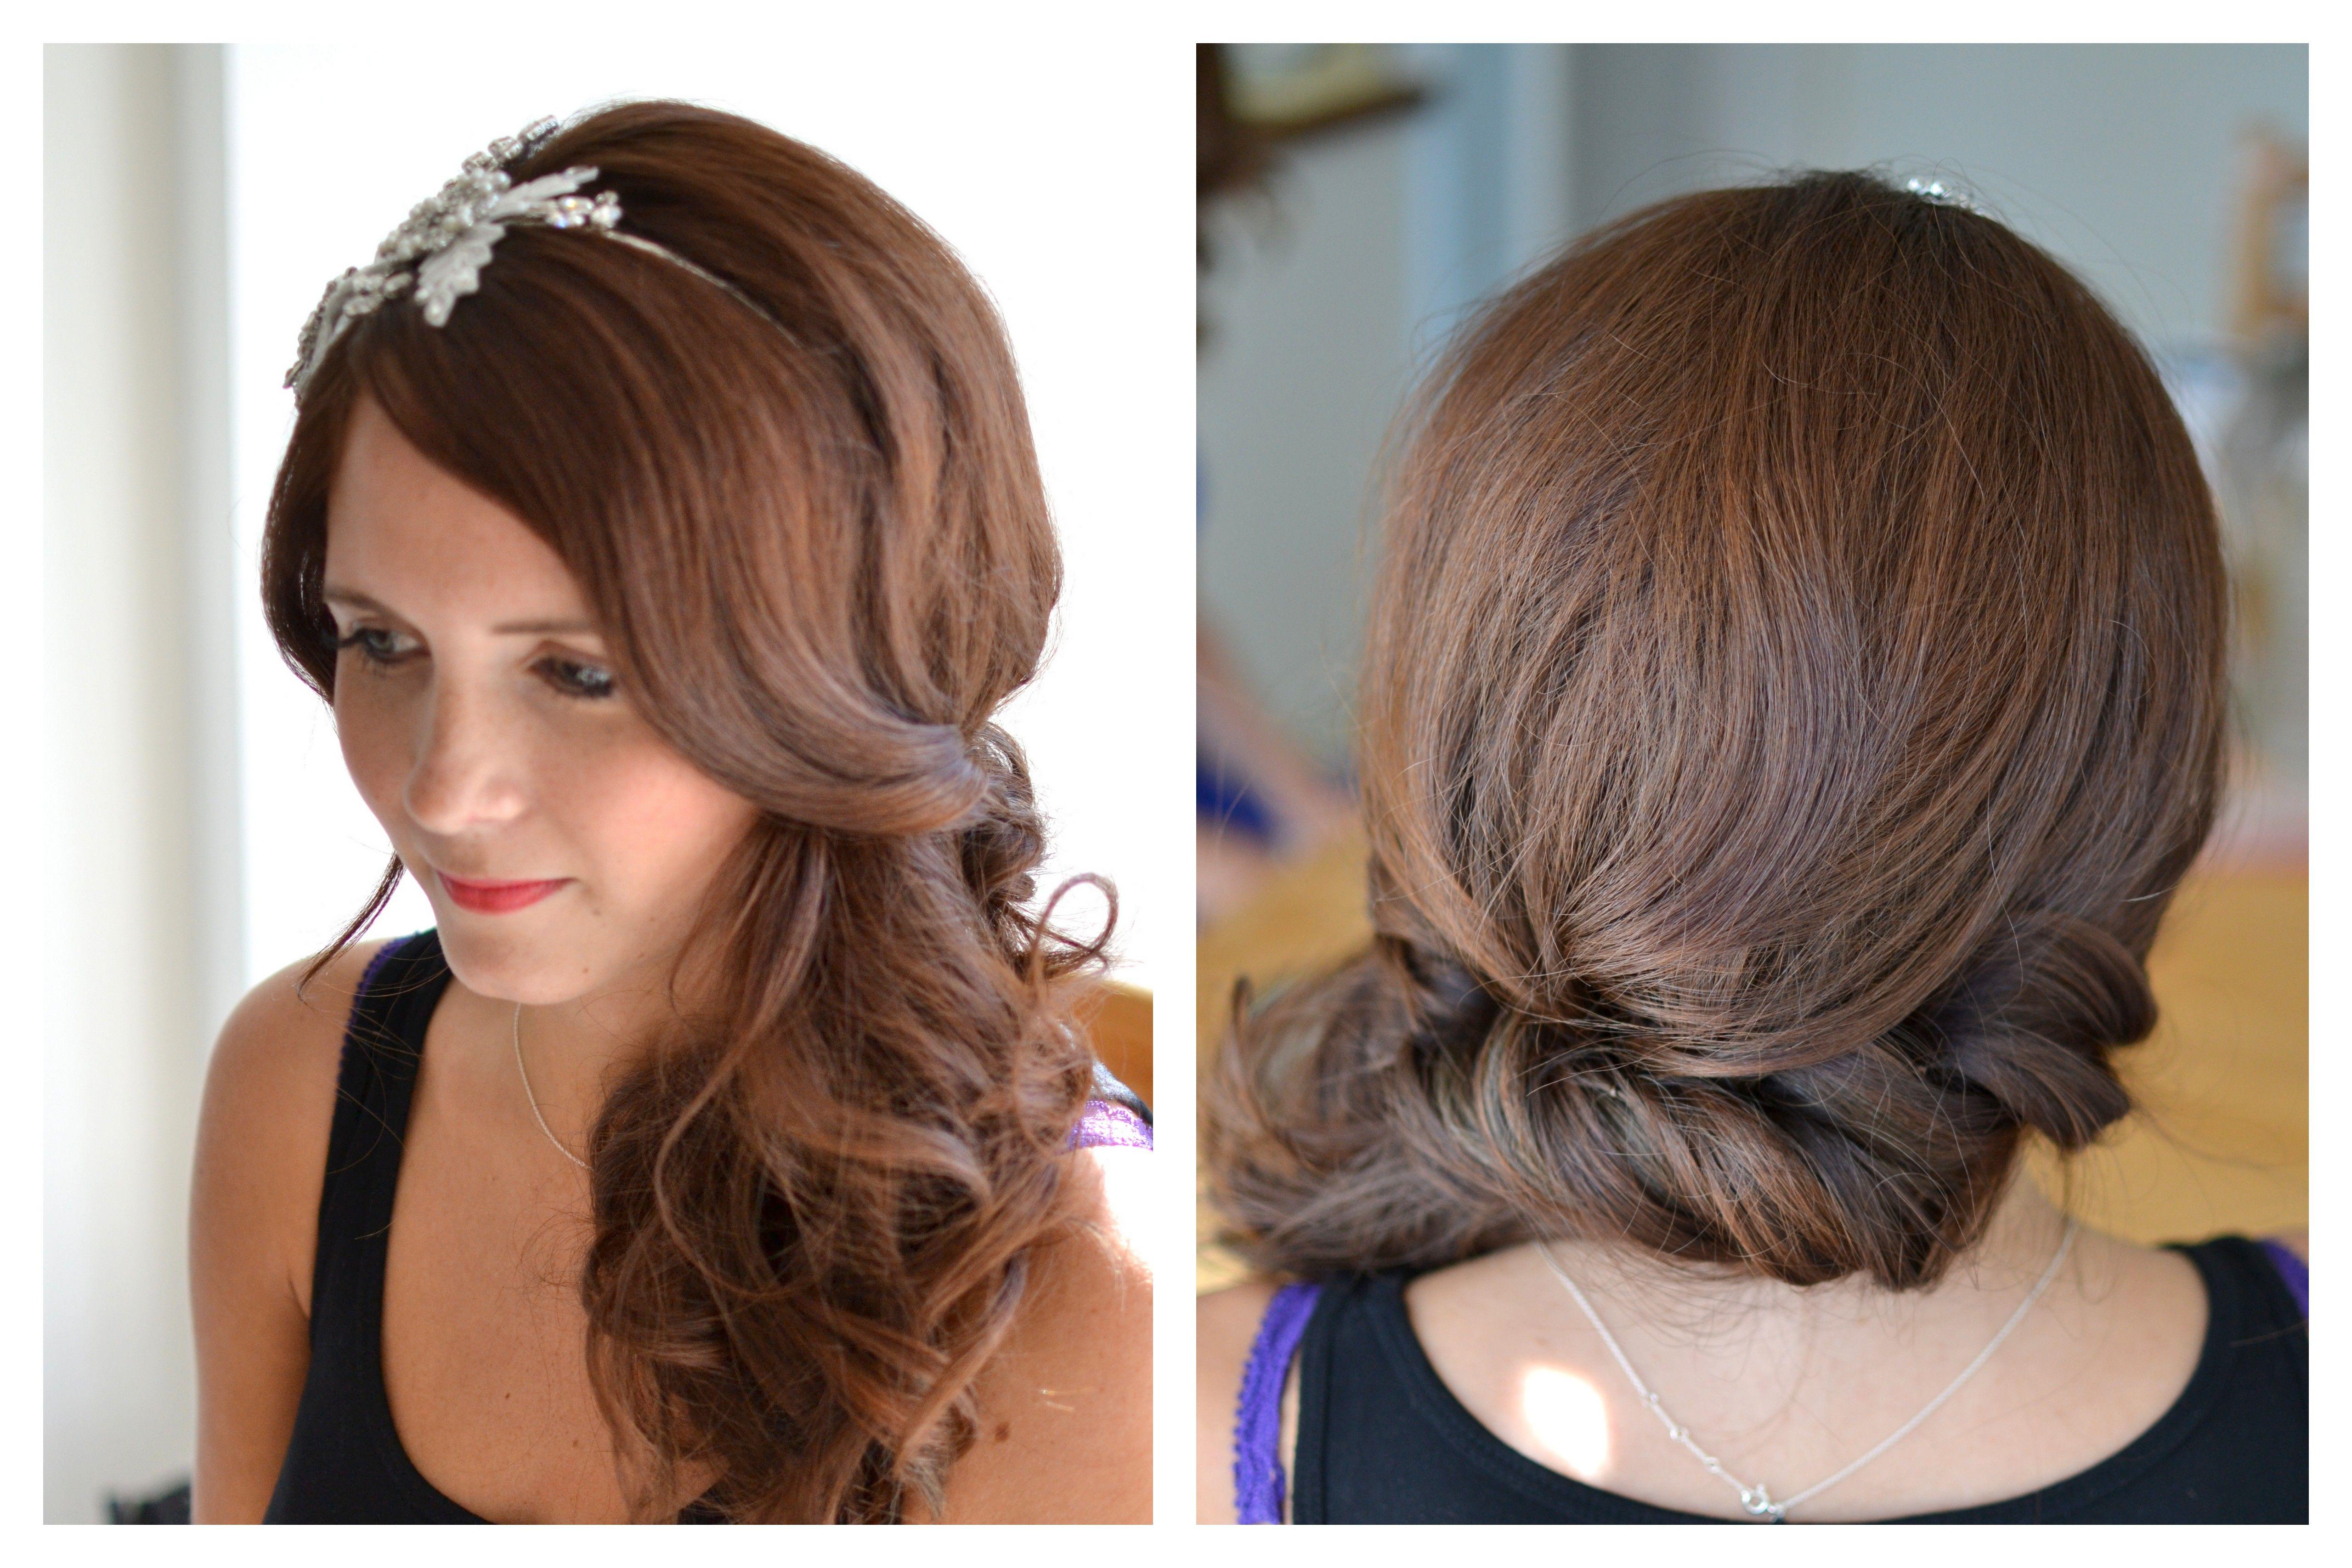 Bride Or Bridesmaid Hair Style Wedding Side Curls Simple Elegant By Www Facebook Com Essexweddingbeauty Hair Styles Bridesmaid Hair Wedding Hairstyles,Stanford D School Design Thinking Model